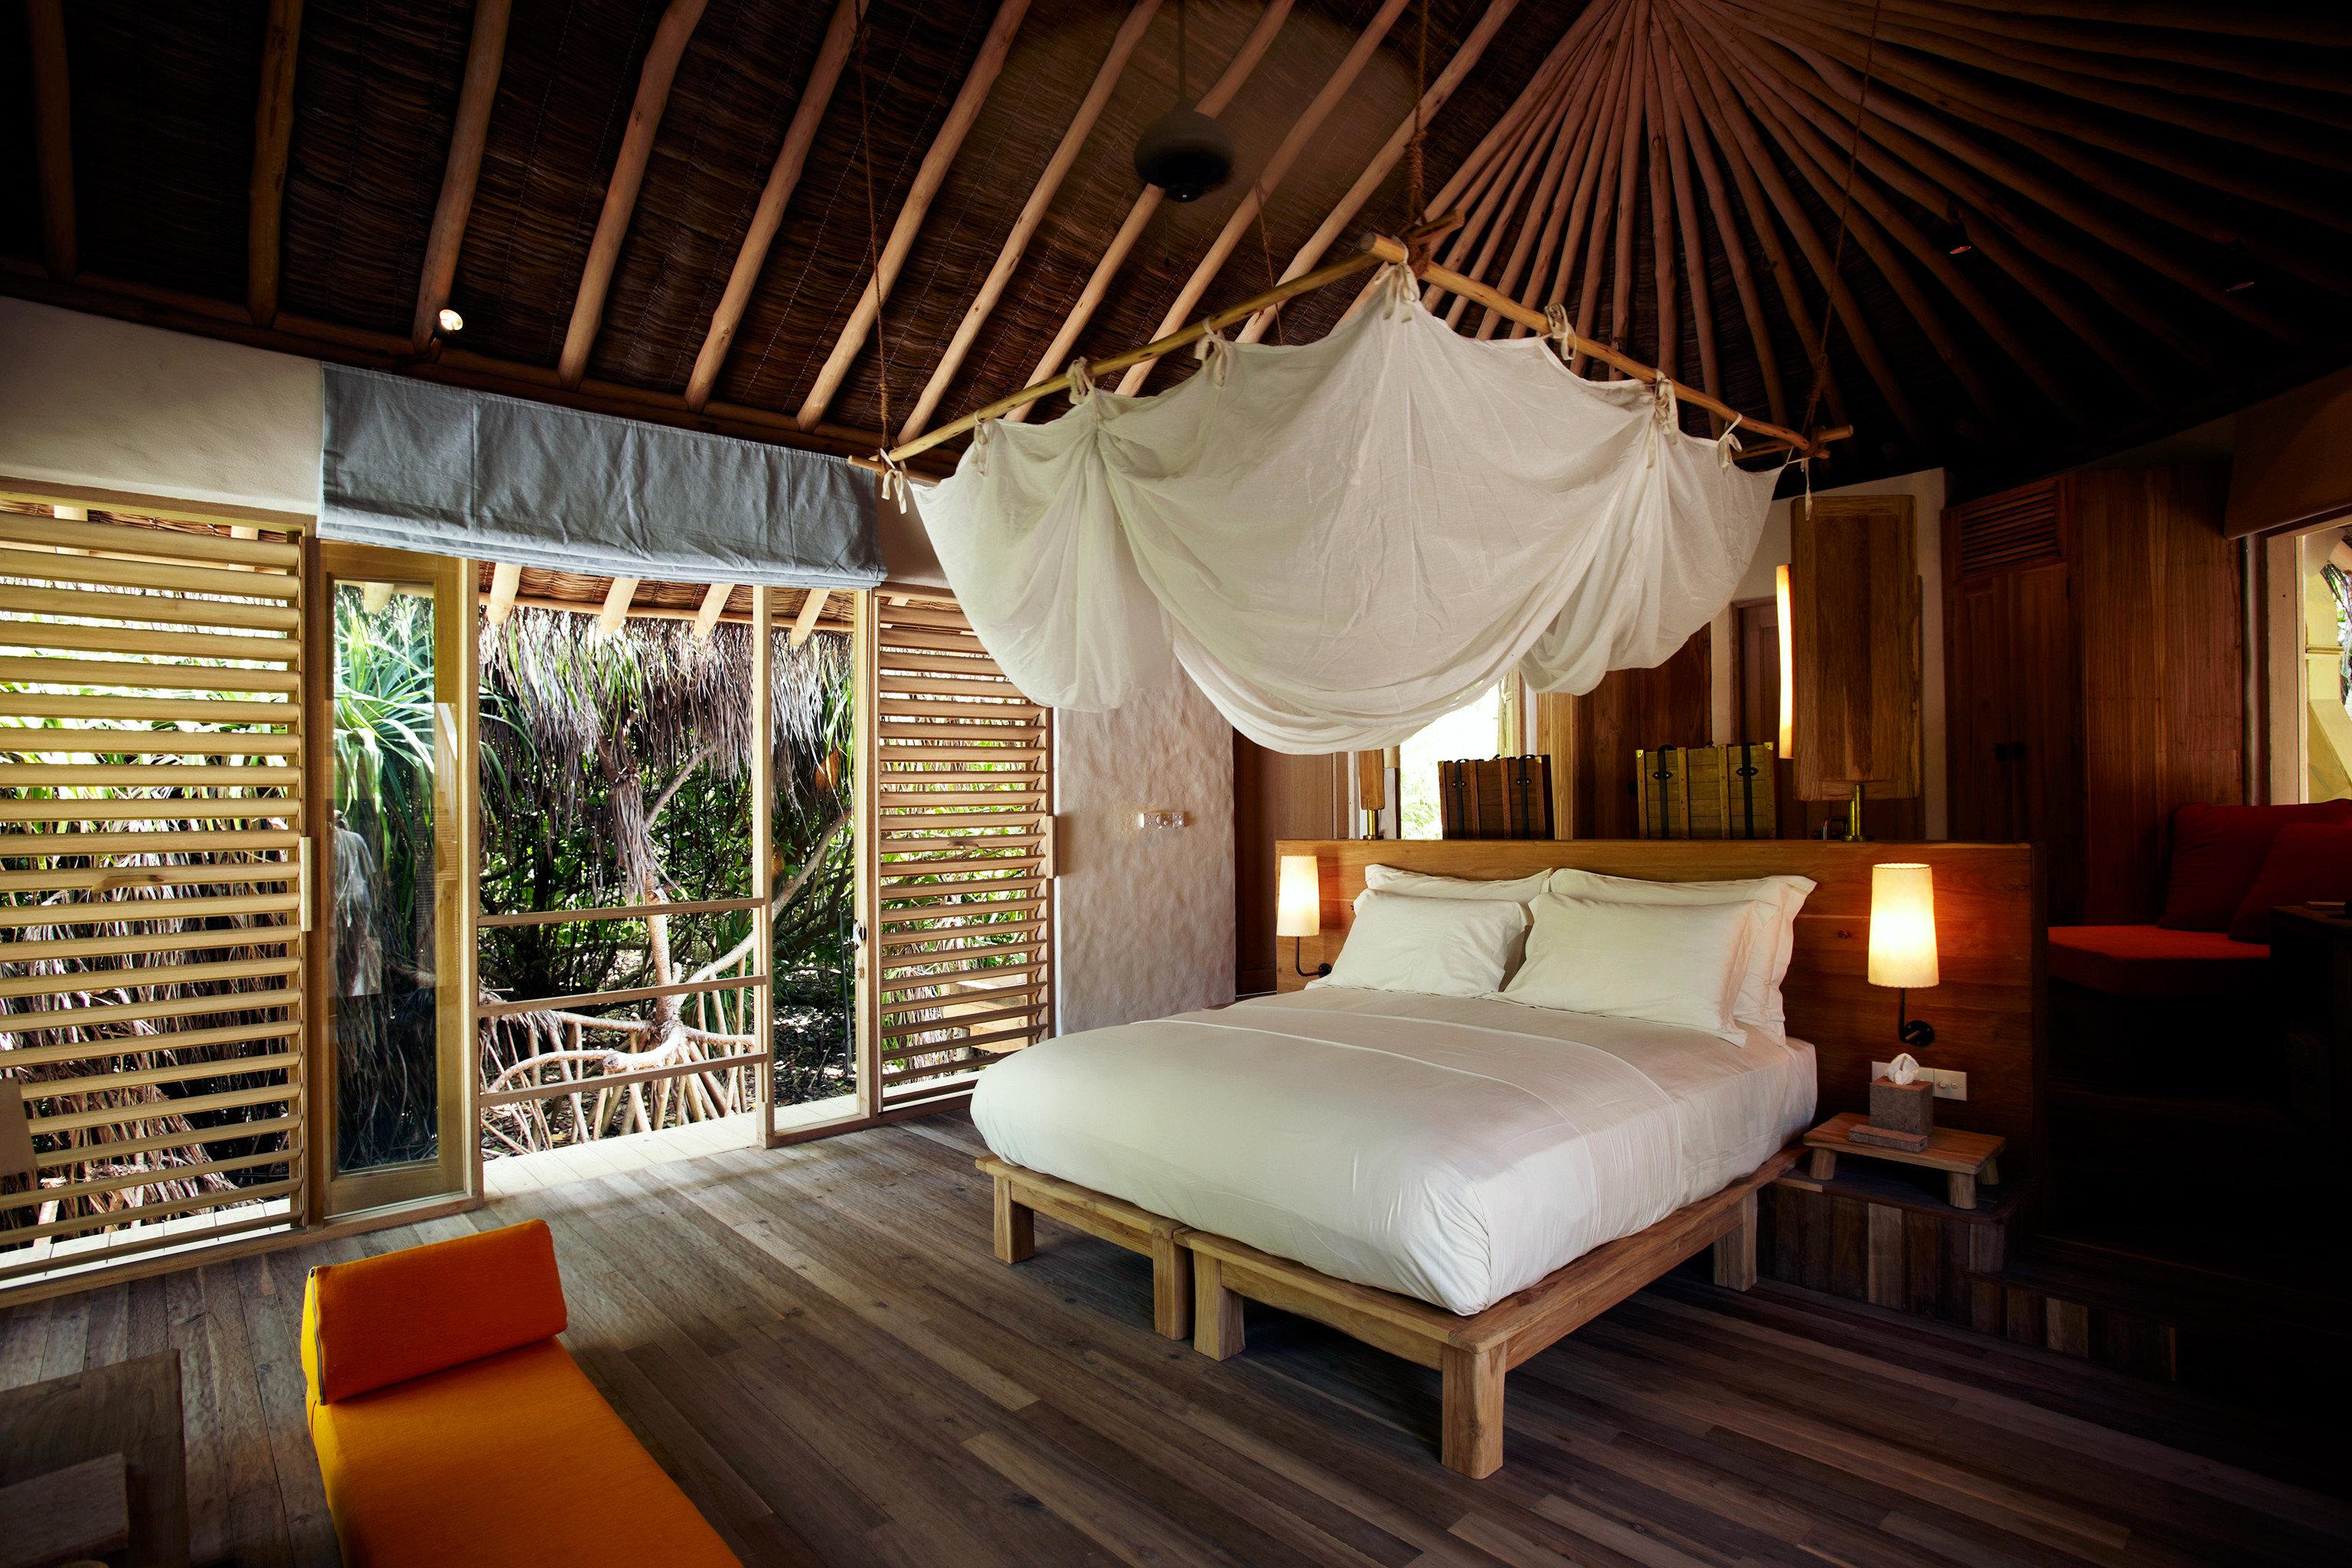 Bedroom Elegant Hotels Islands Luxury Patio Scenic views Suite Trip Ideas property Resort Villa cottage eco hotel